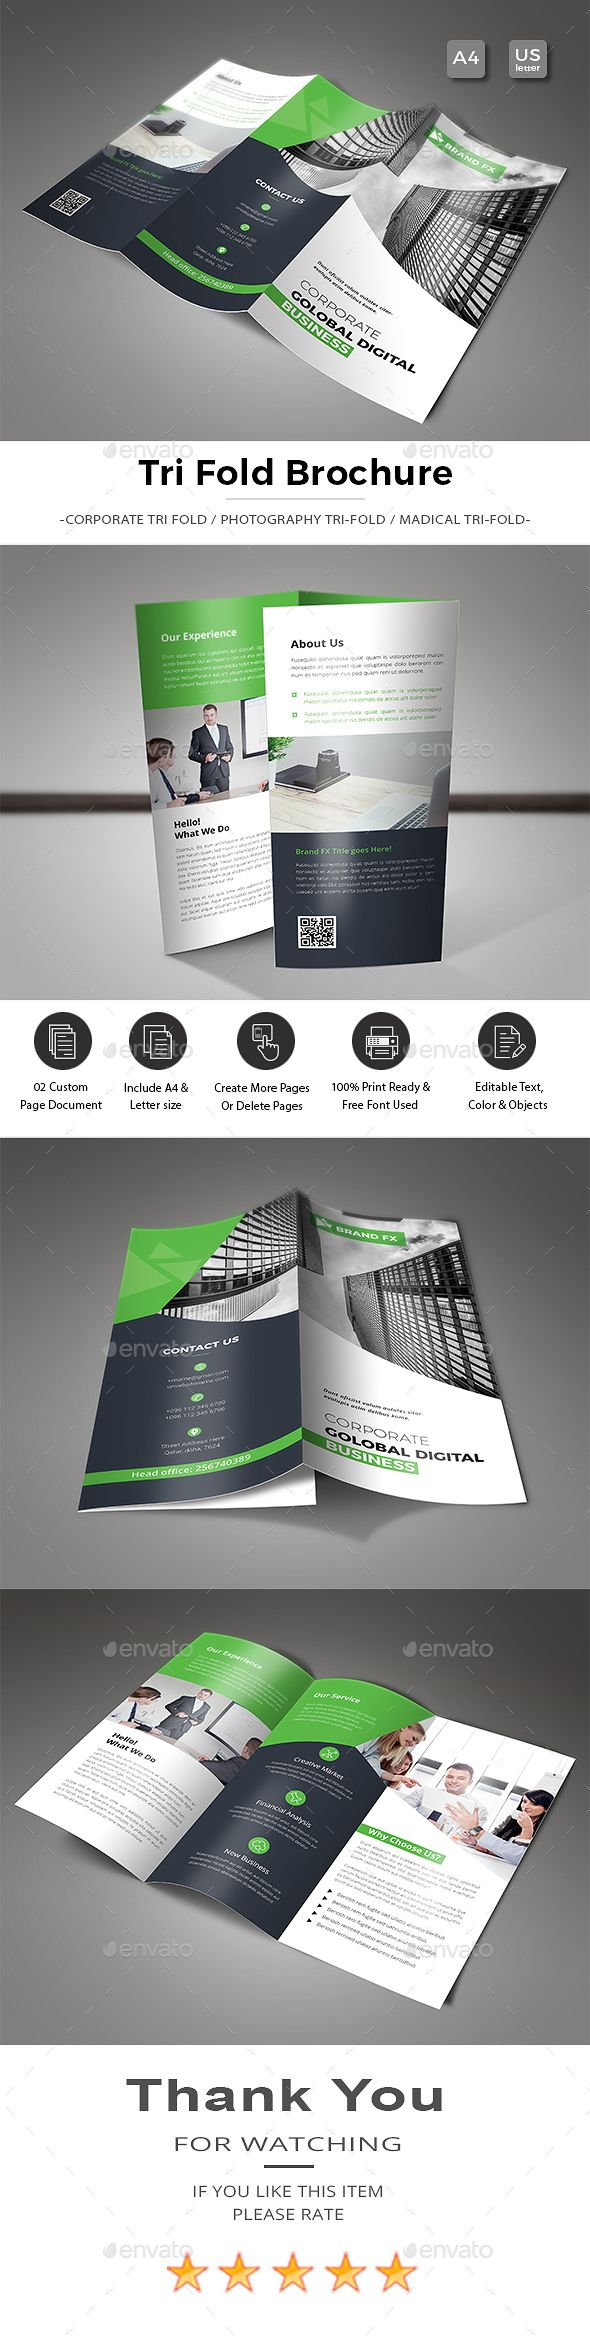 TriFold Brochure  Tri Fold Brochure Brochures And Tri Fold